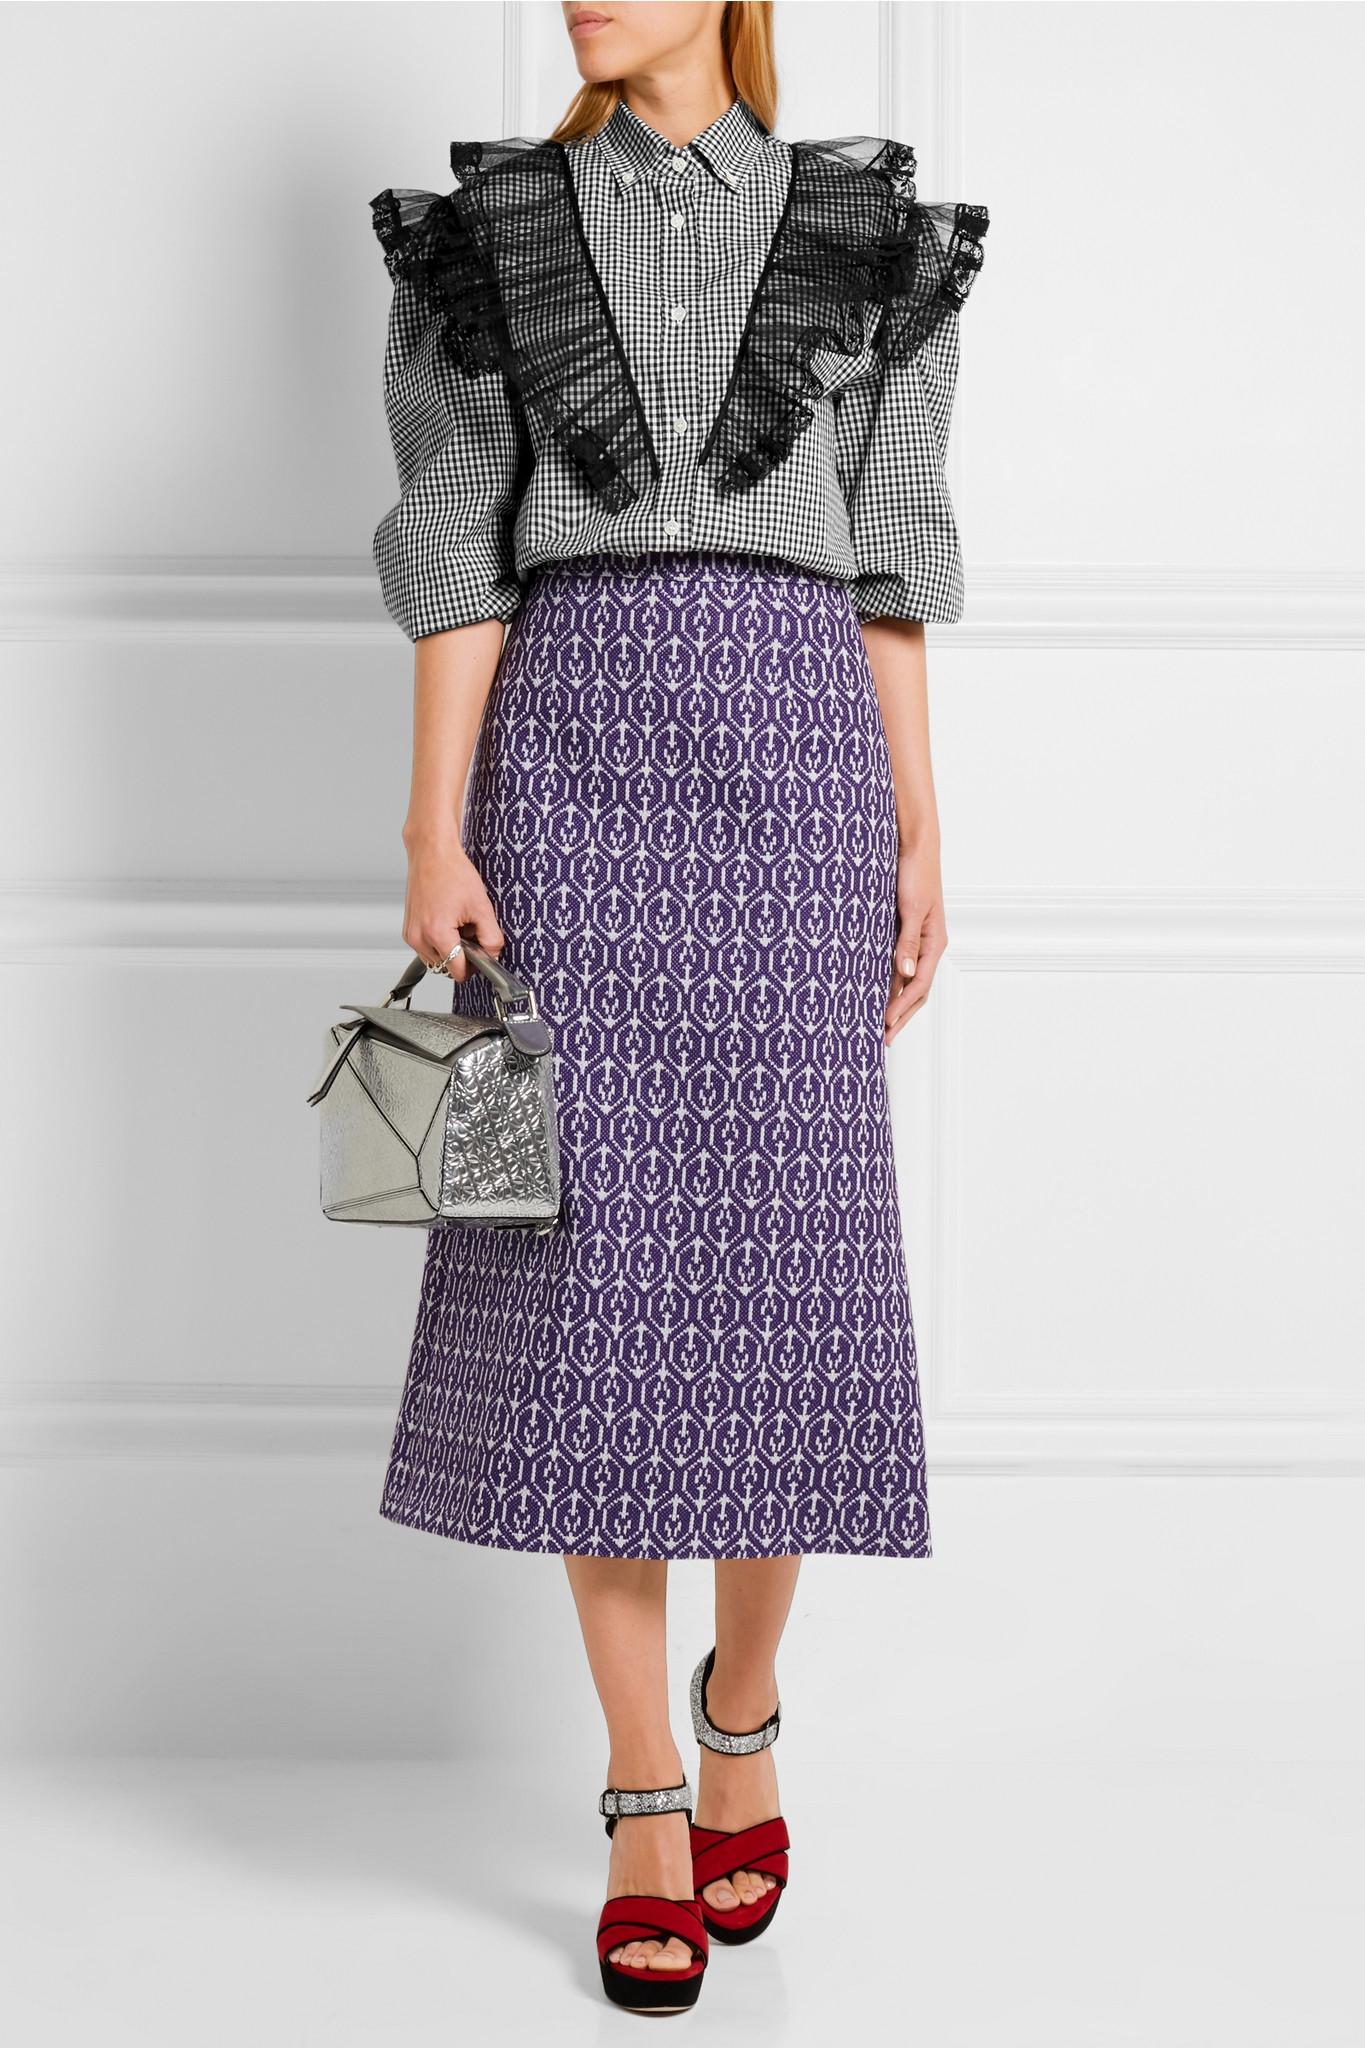 e1eec4ceacb440 Miu Miu Ruffled Lace And Tulle-paneled Cotton-poplin Shirt in Black ...